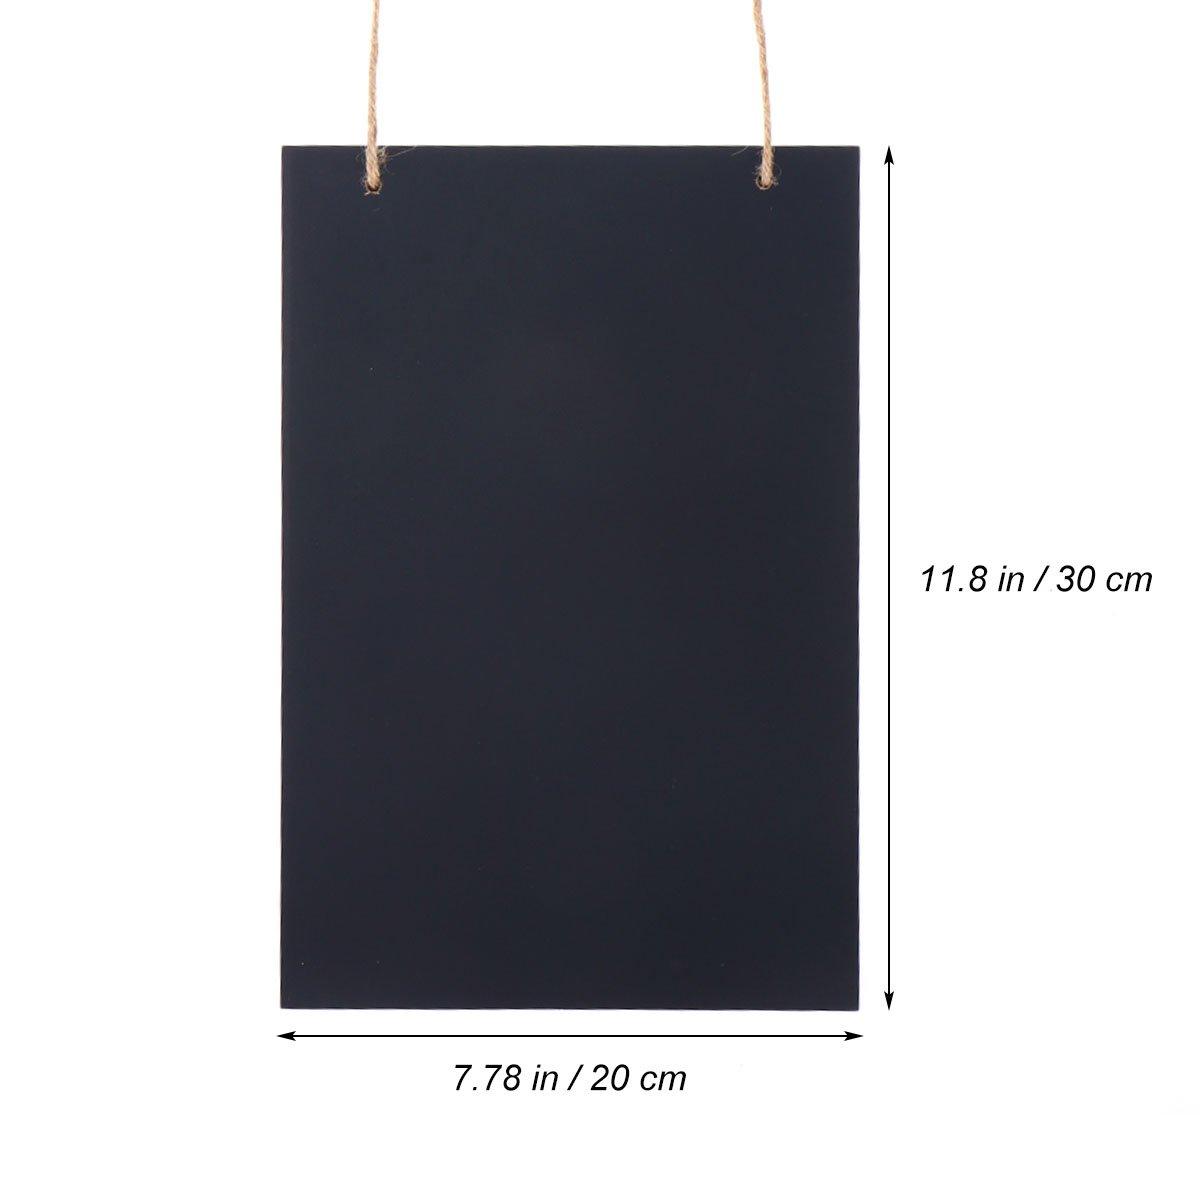 WINOMO Vintage Frameless Wooden Chalkboard Sign Rustic Decorative Hanging Blackboard 20x30x0.5cm